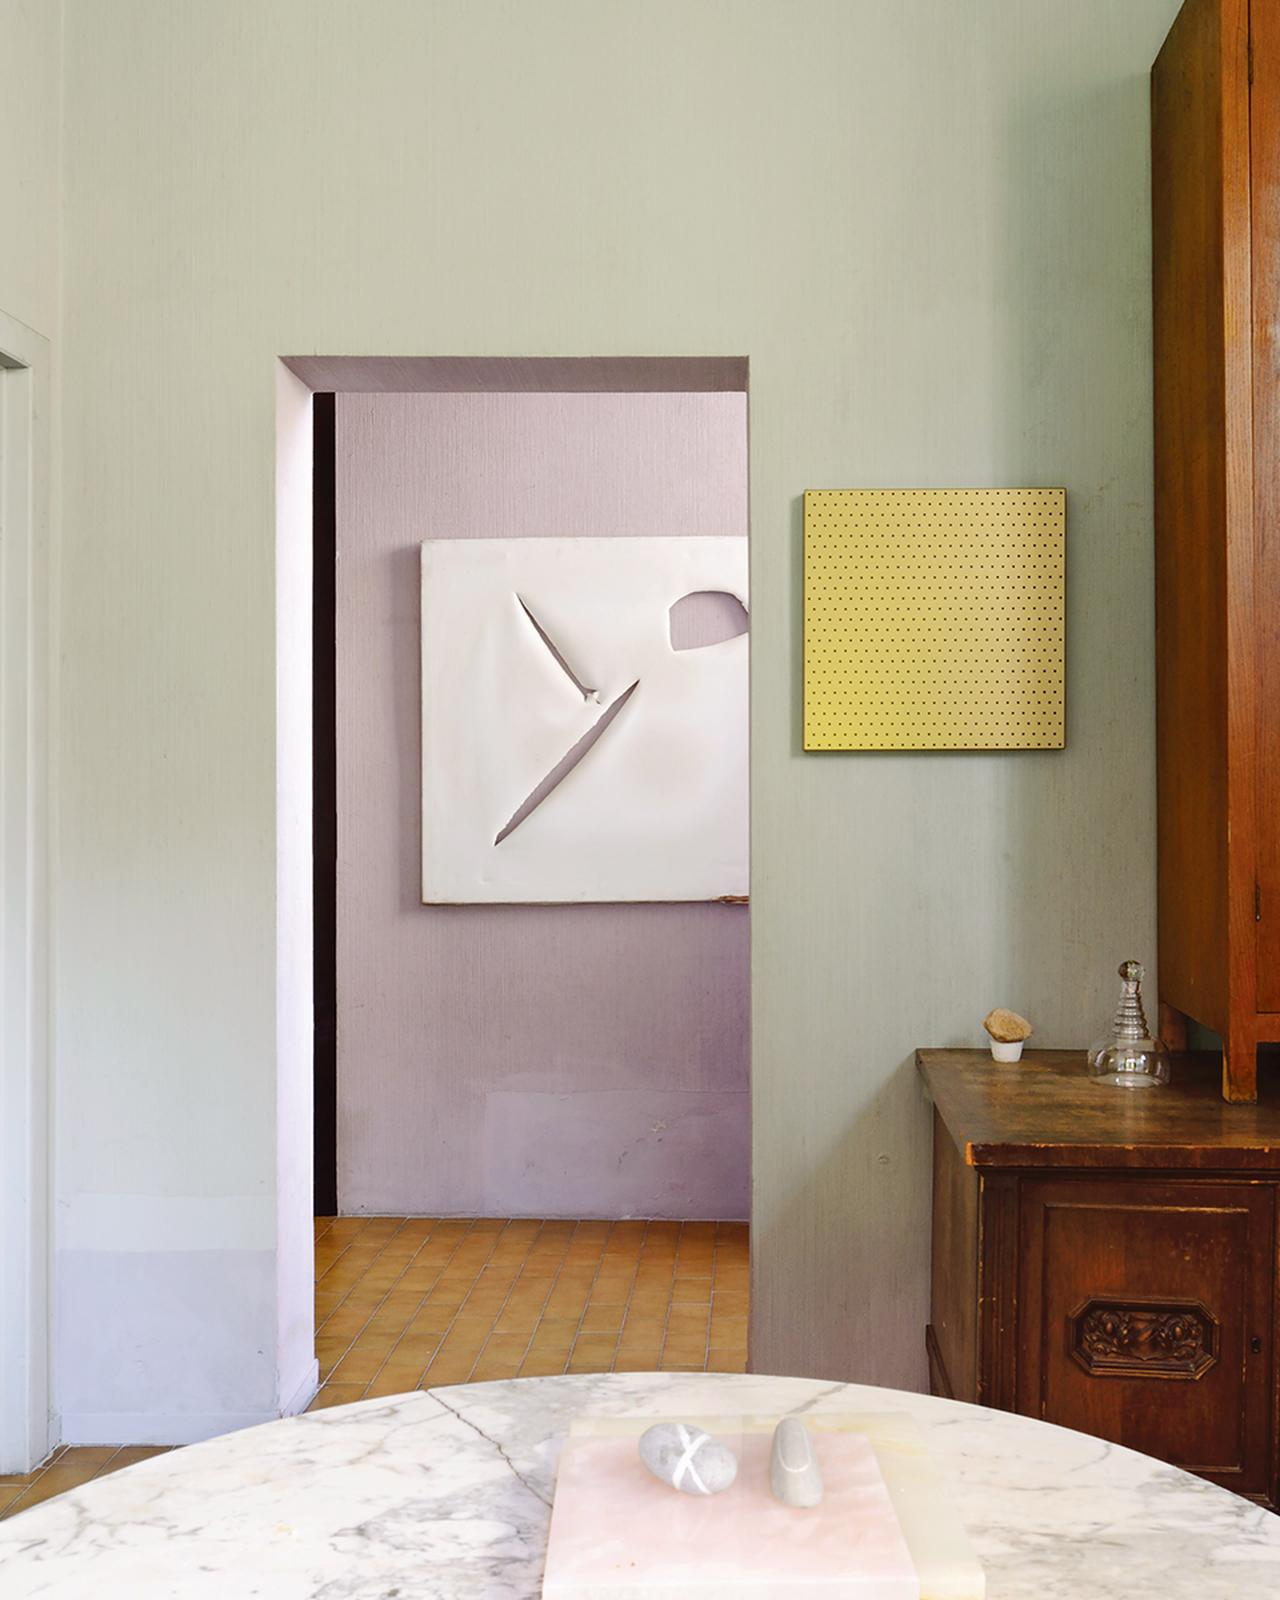 Images : 2番目の画像 - 「建築家トニョンが試みる 実験的な住まいのかたち」のアルバム - T JAPAN:The New York Times Style Magazine 公式サイト